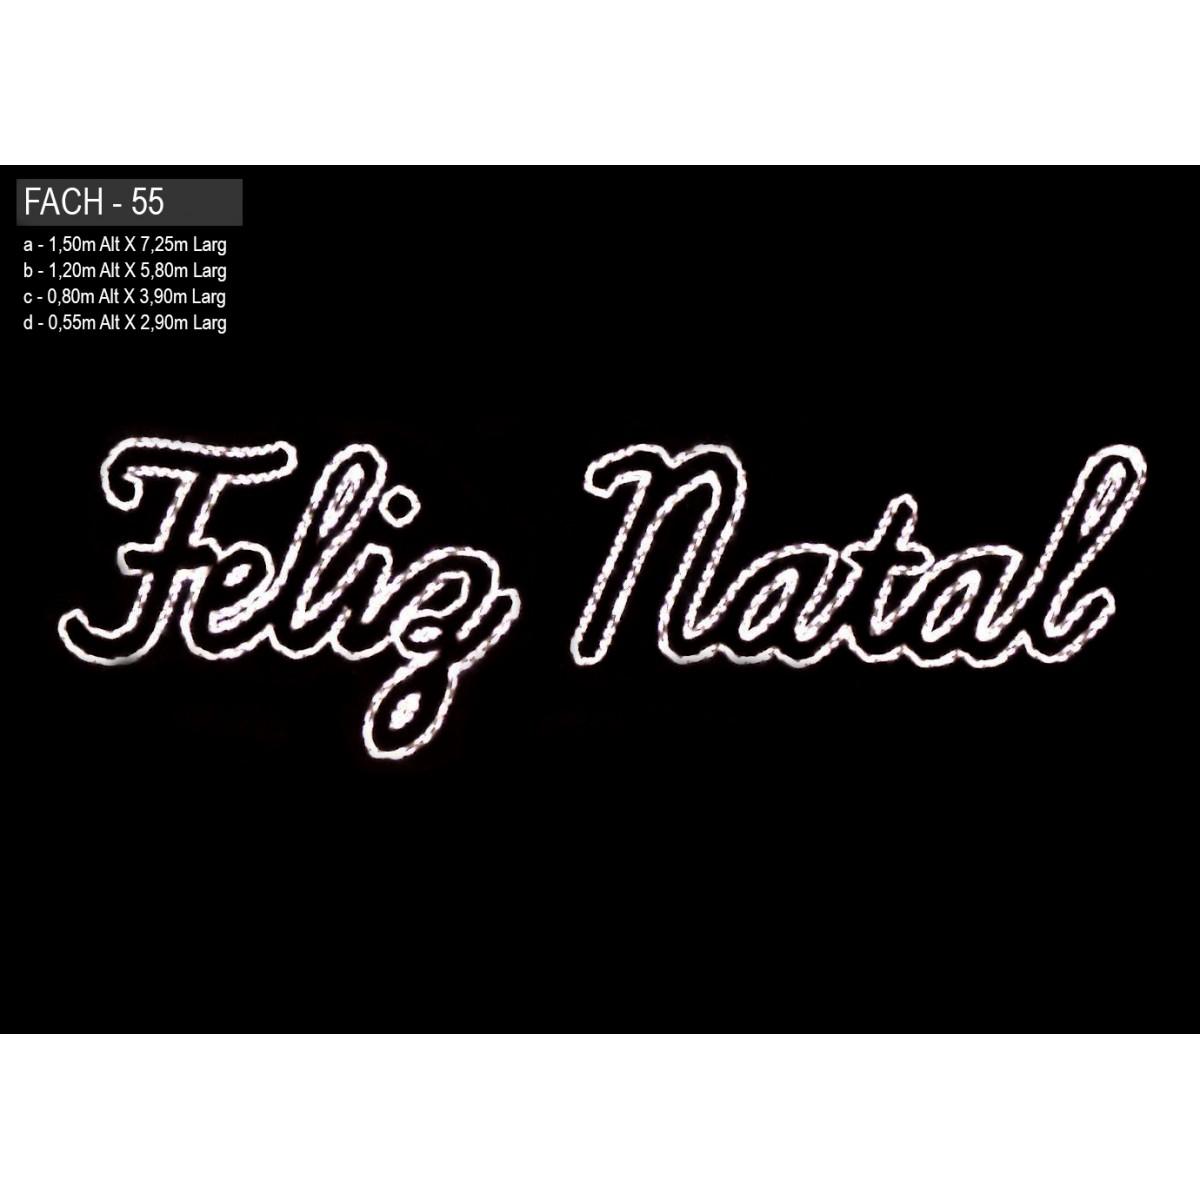 Painel de Natal PN-056-FE/B Iluminado Led - Feliz Natal - MED 1,20 x 5,80 mts